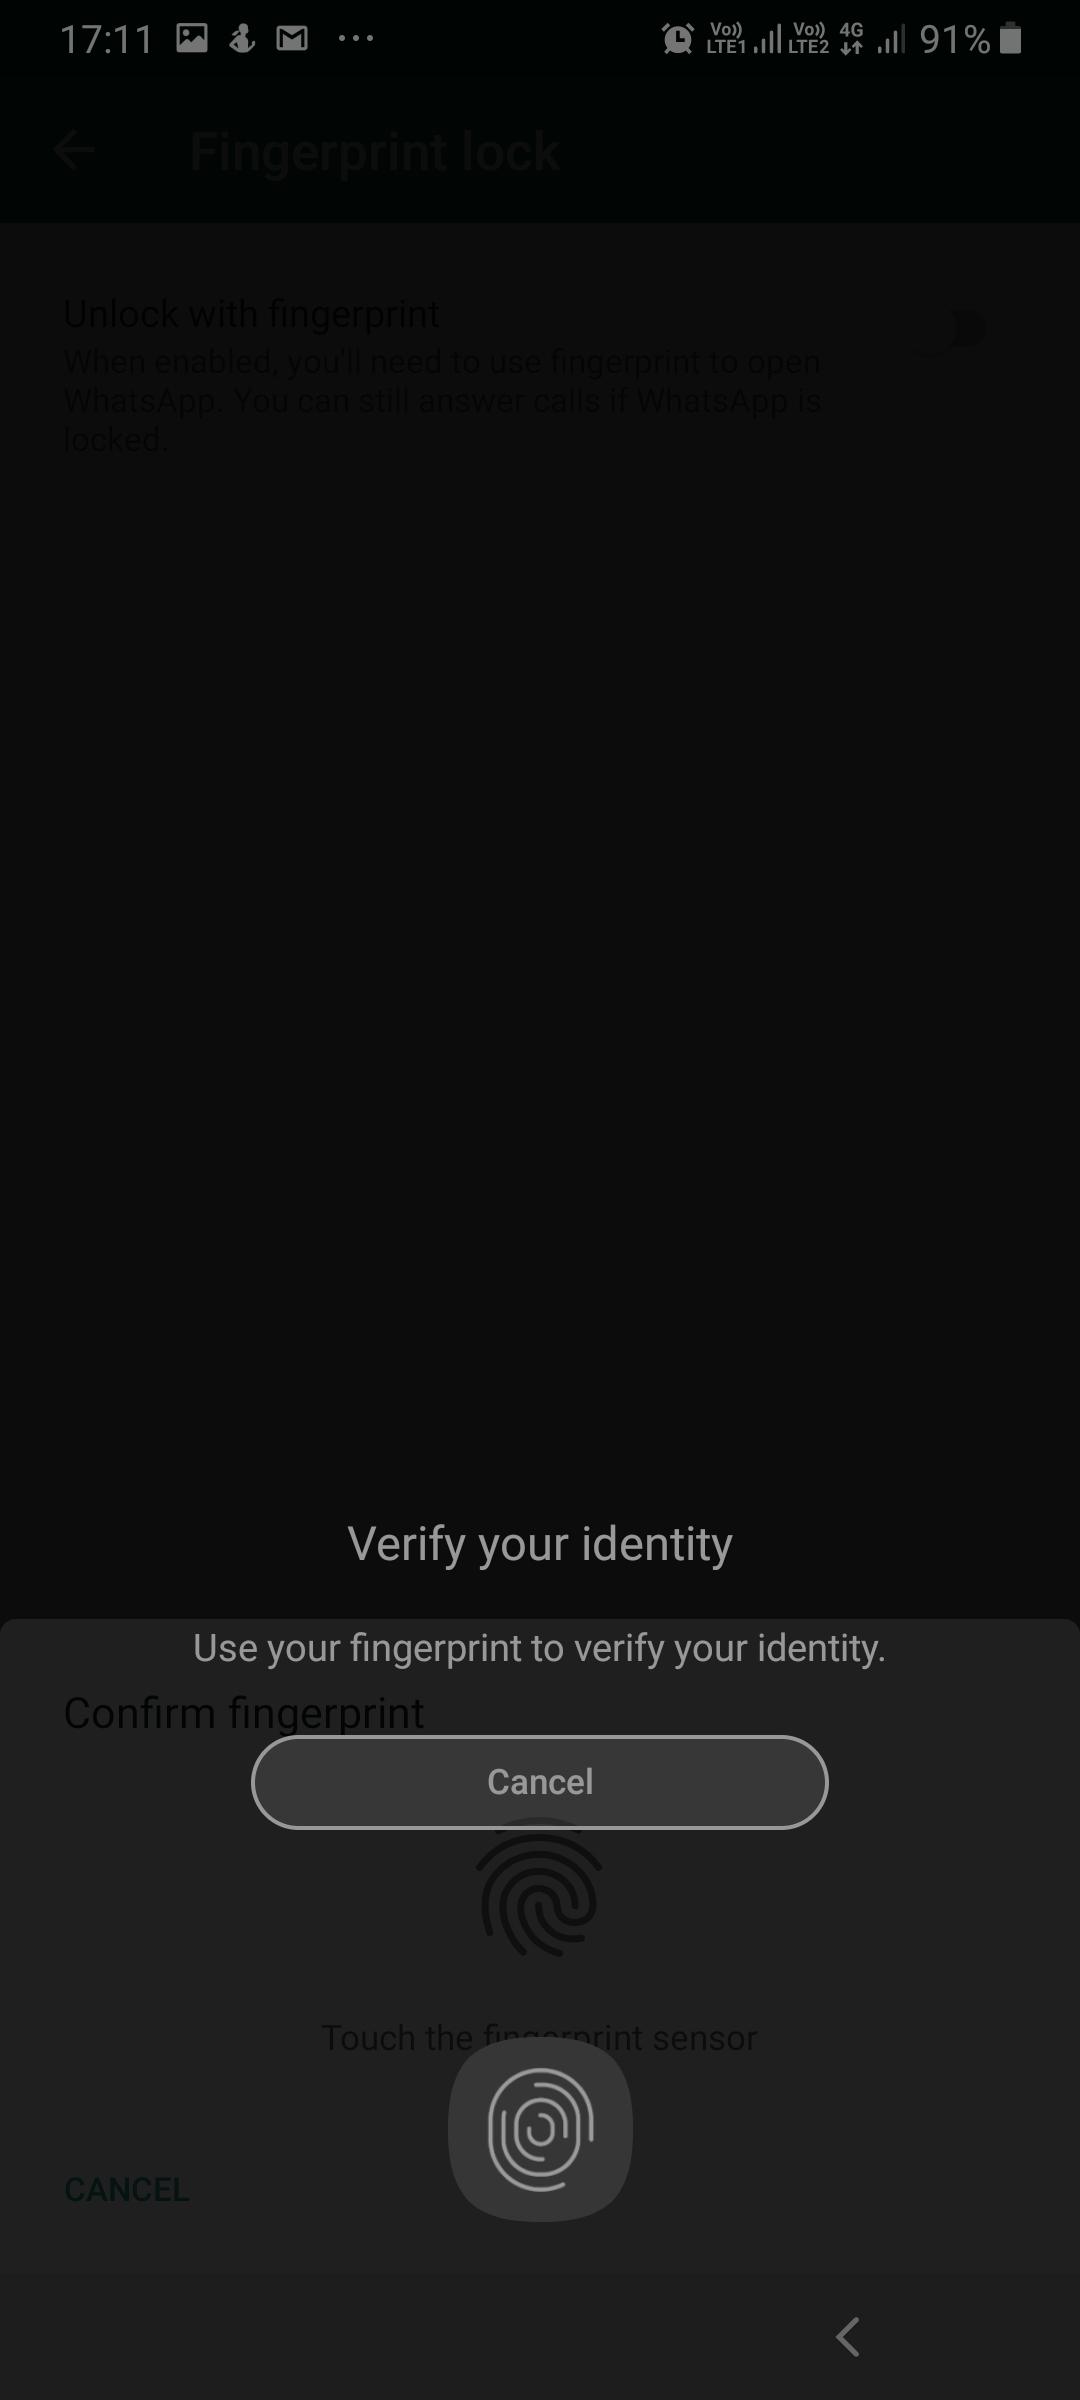 WhatsApp Fingerprint